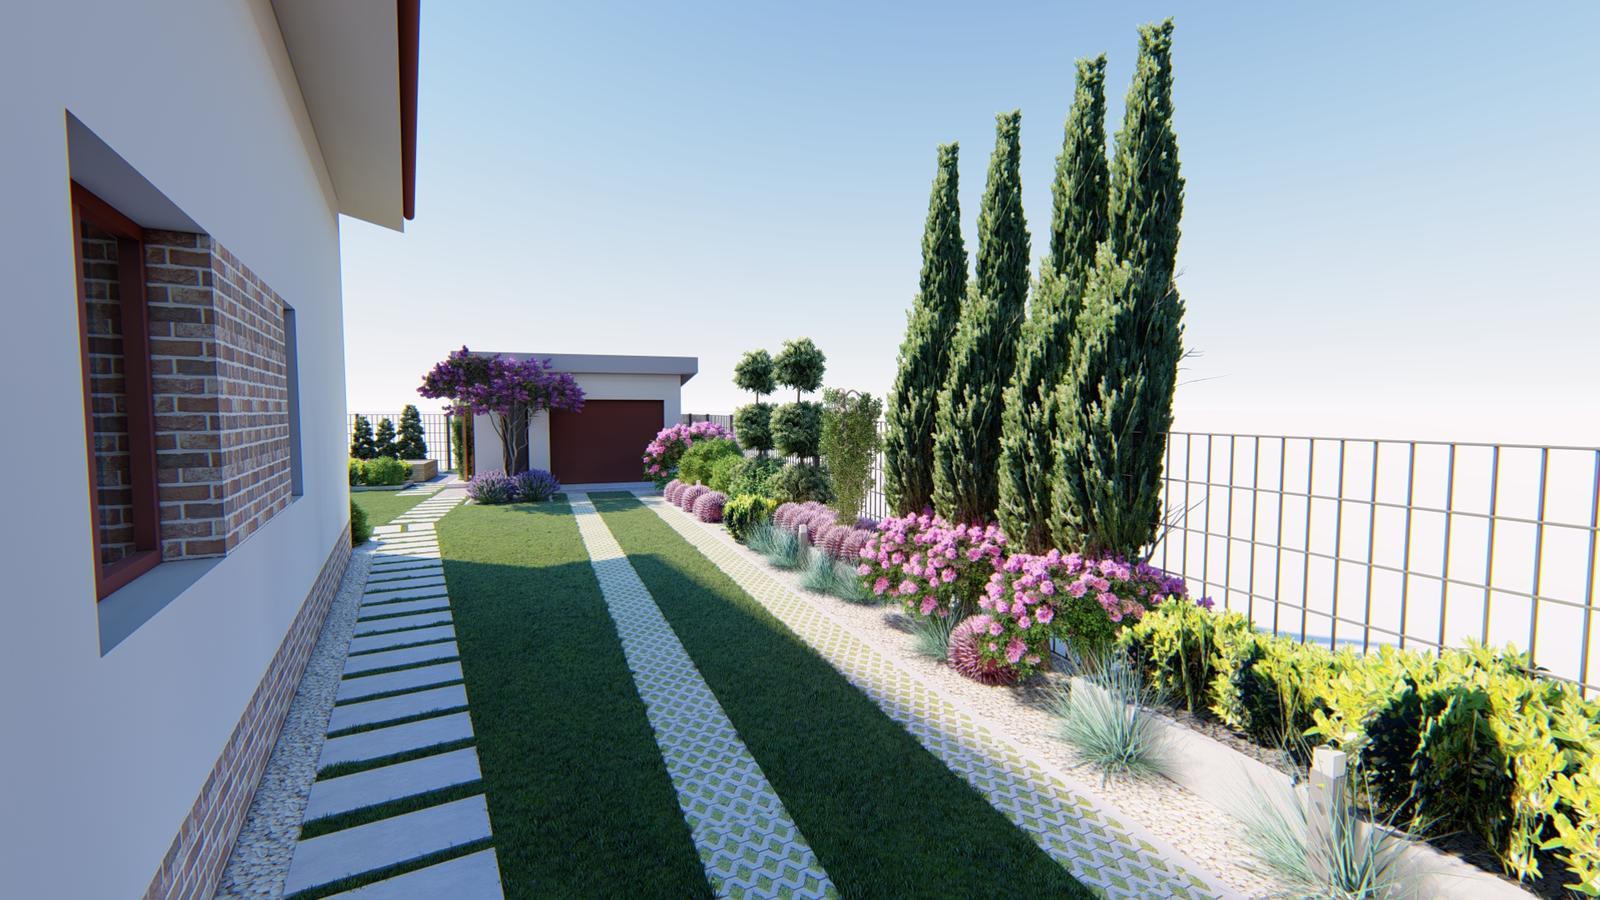 Návrh záhrady rodinného domu. - Obrázok č. 4